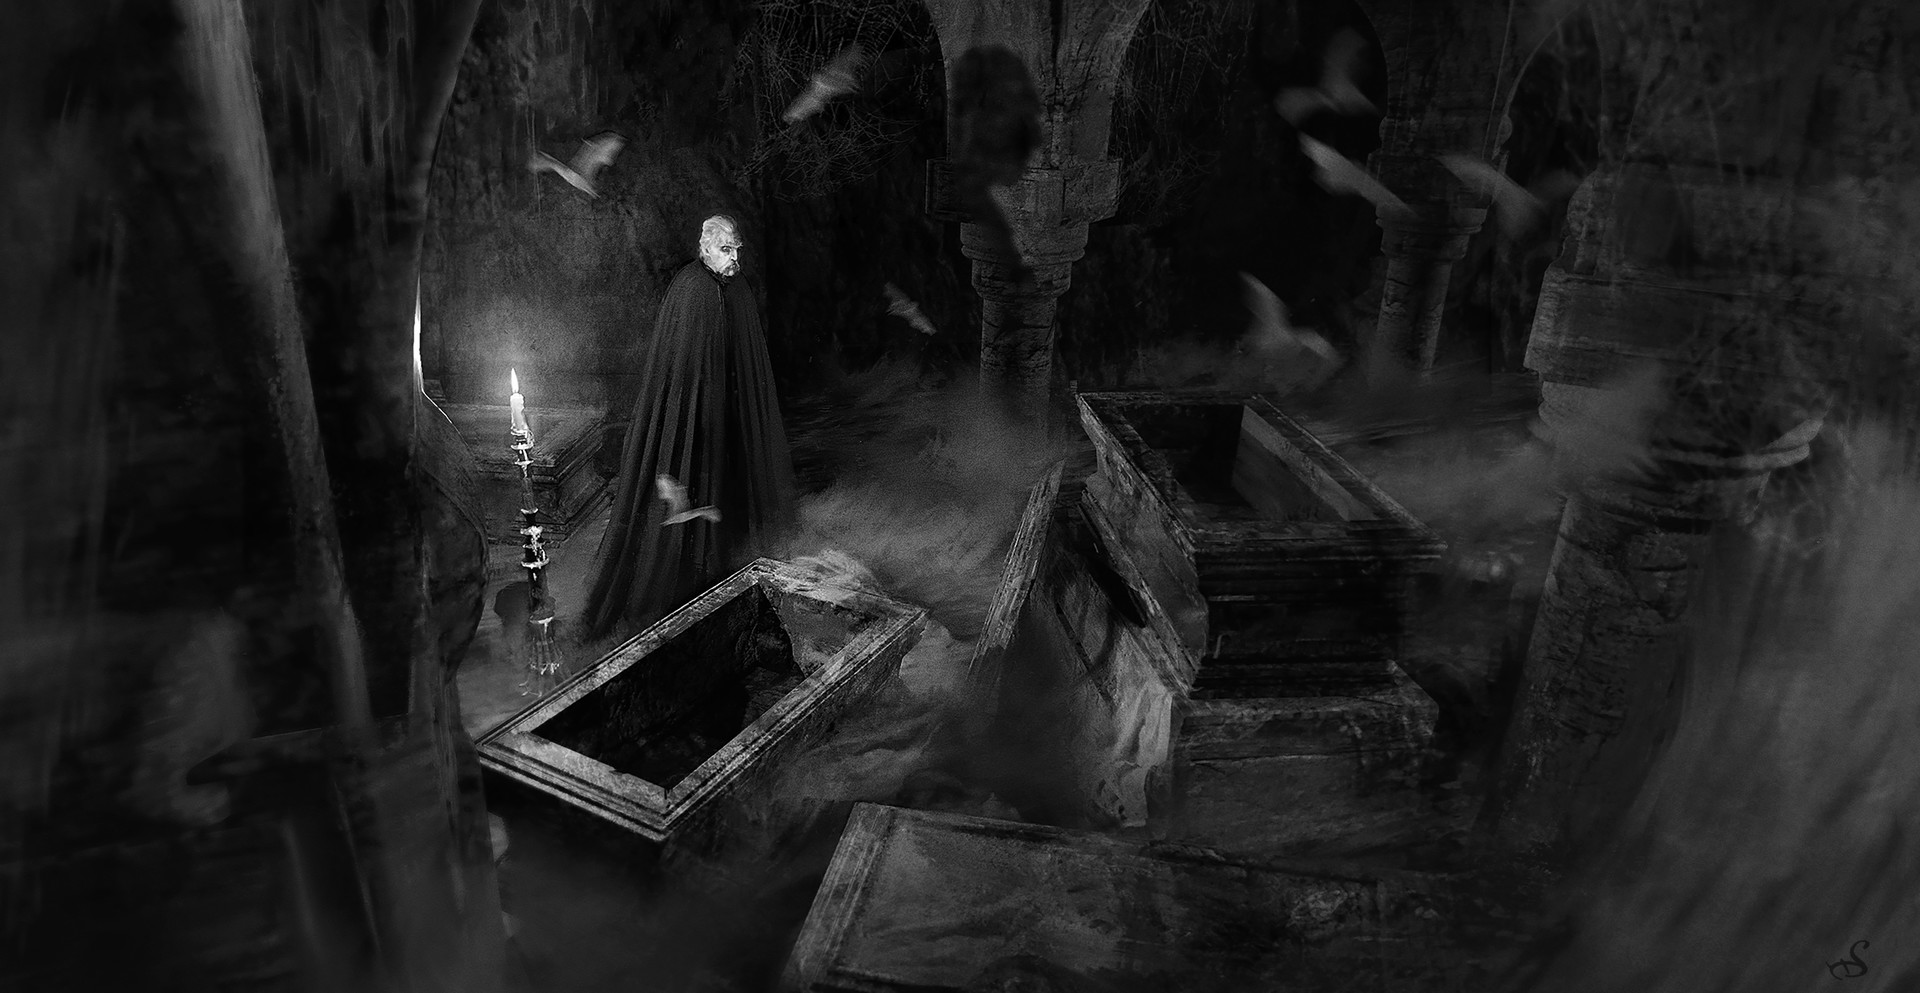 Sebastien ecosse dracula crypt vampire sebastien ecosse illustration tomb b w 300dpi bonordre